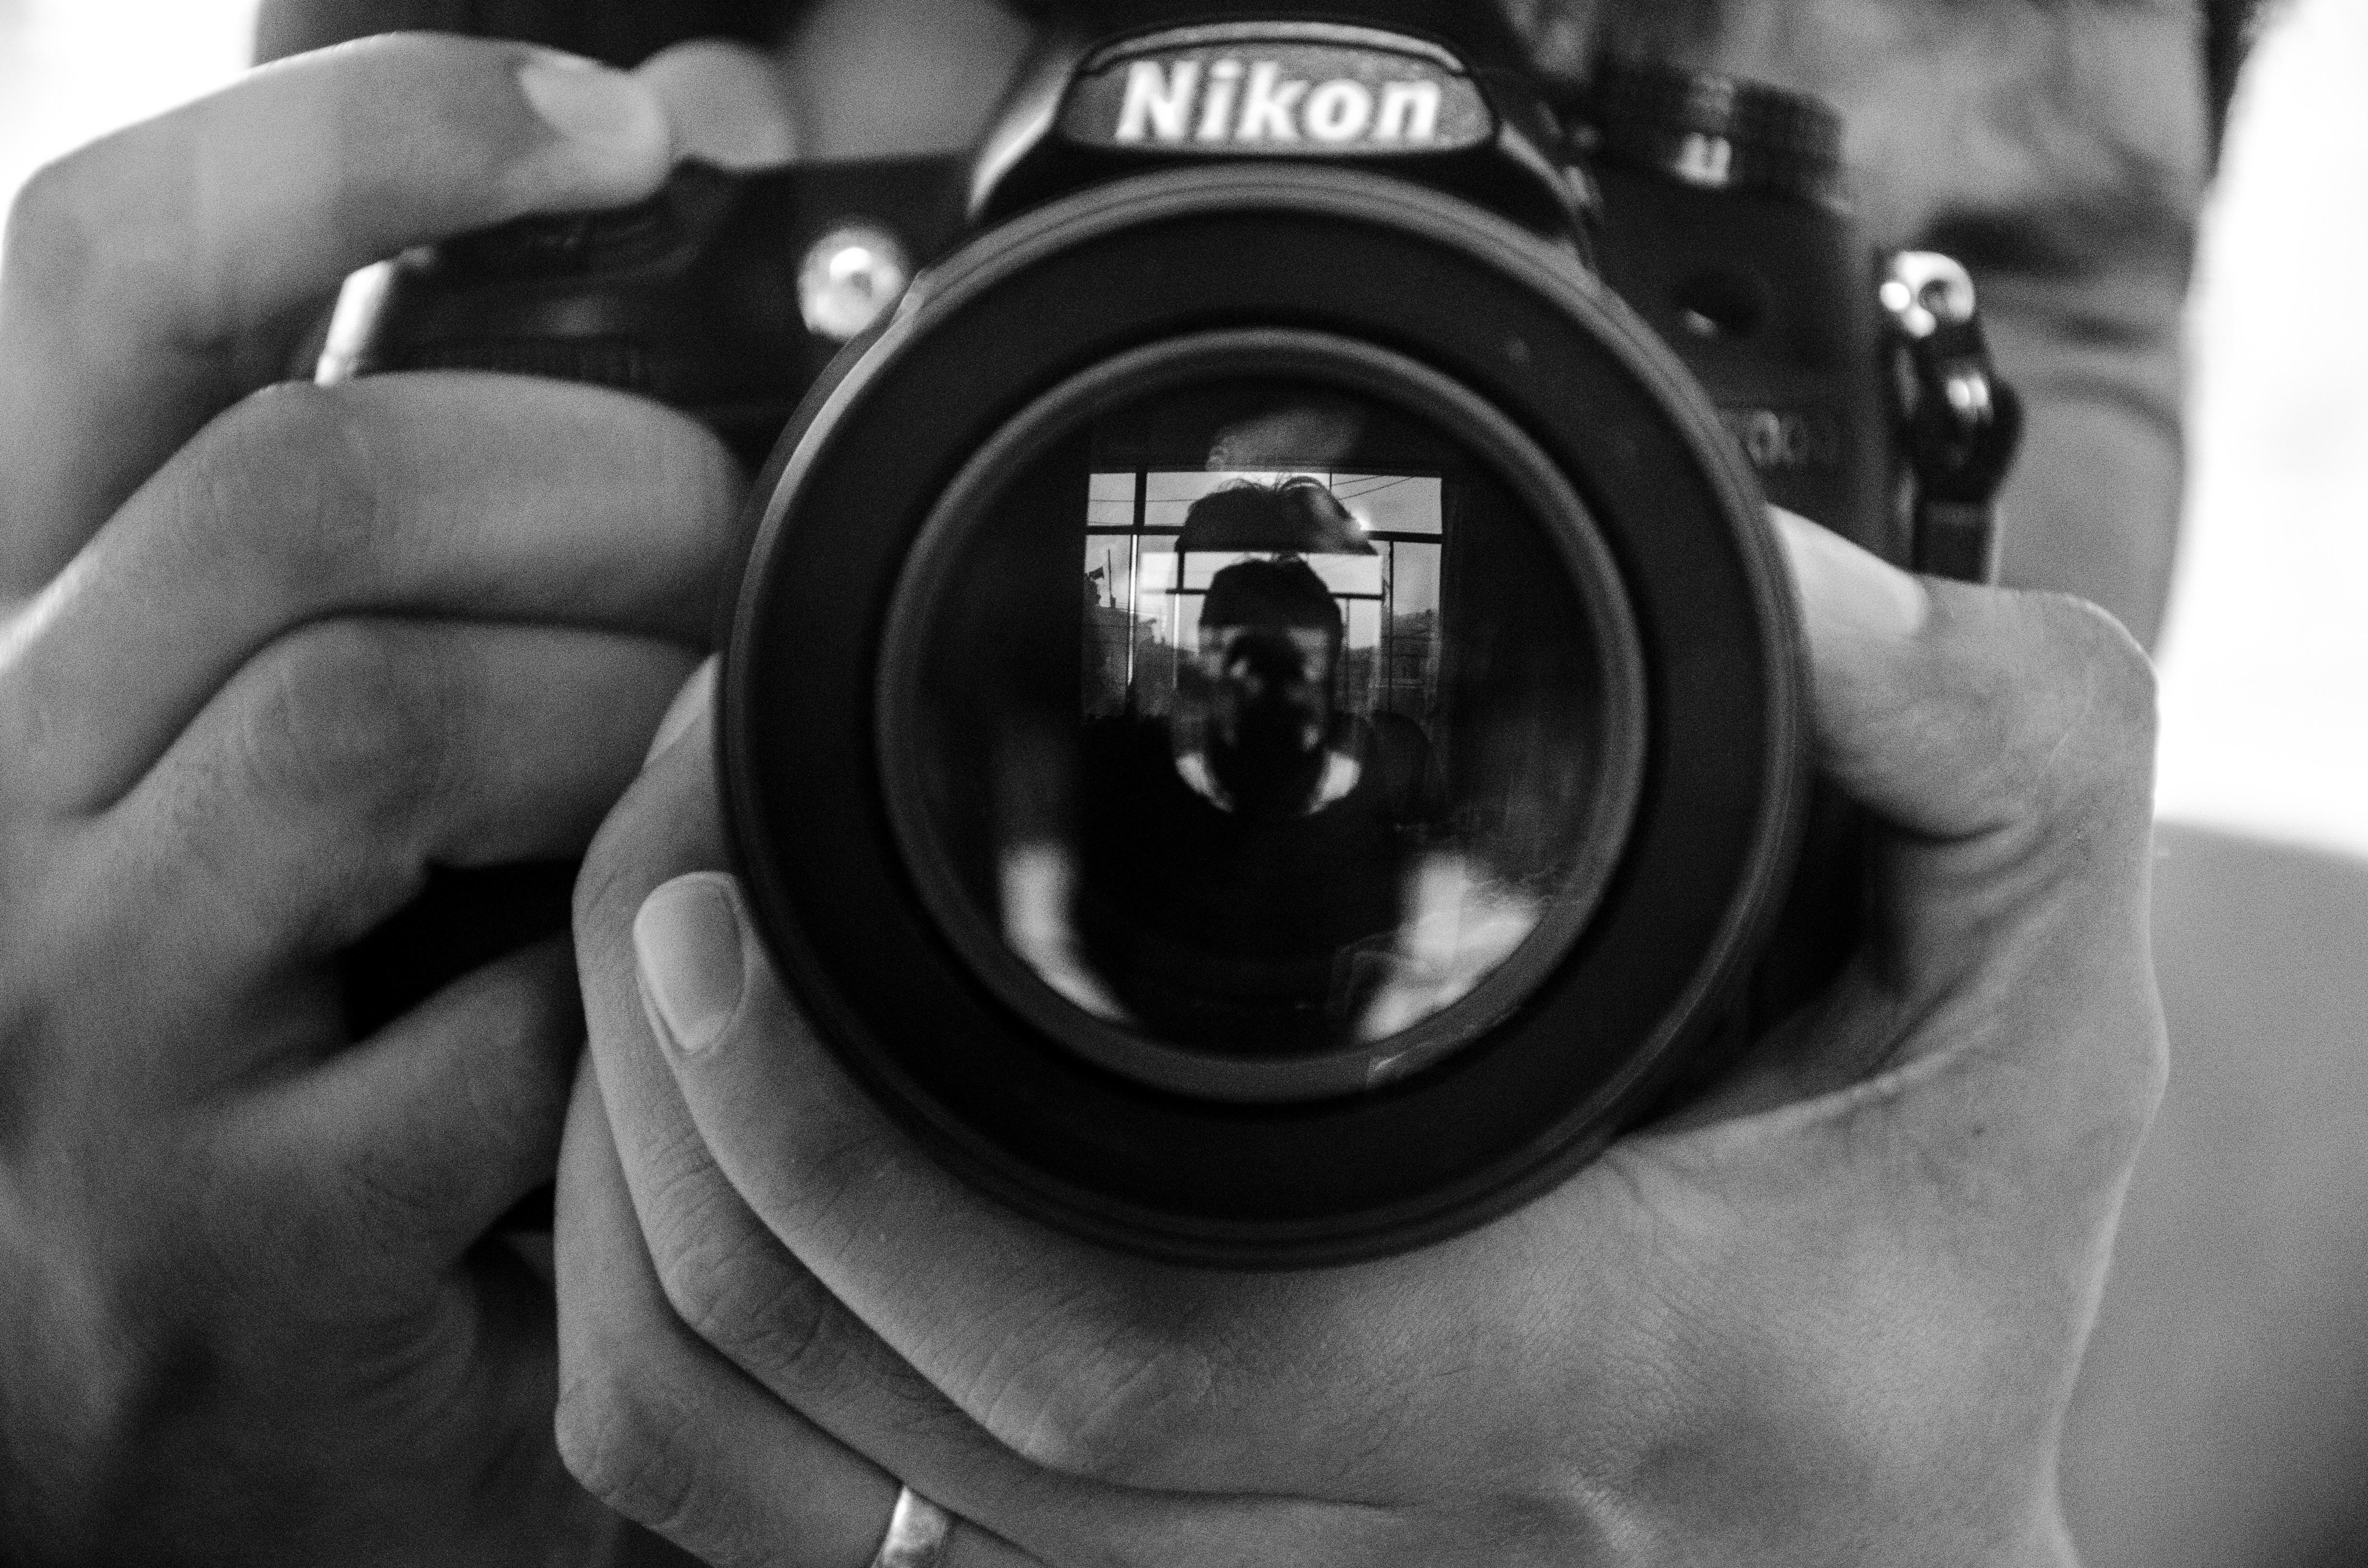 hand-black-and-white-camera-photography-photographer-wheel-nikon-black-monochrome-close-up-reflex-camera-digital-camera-photograph-camera-lens-monochrome-photography-digital-slr-single-lens-reflex-camera-cameras-optics-mirrorless-interchangeable-lens-camera-661739.jpg